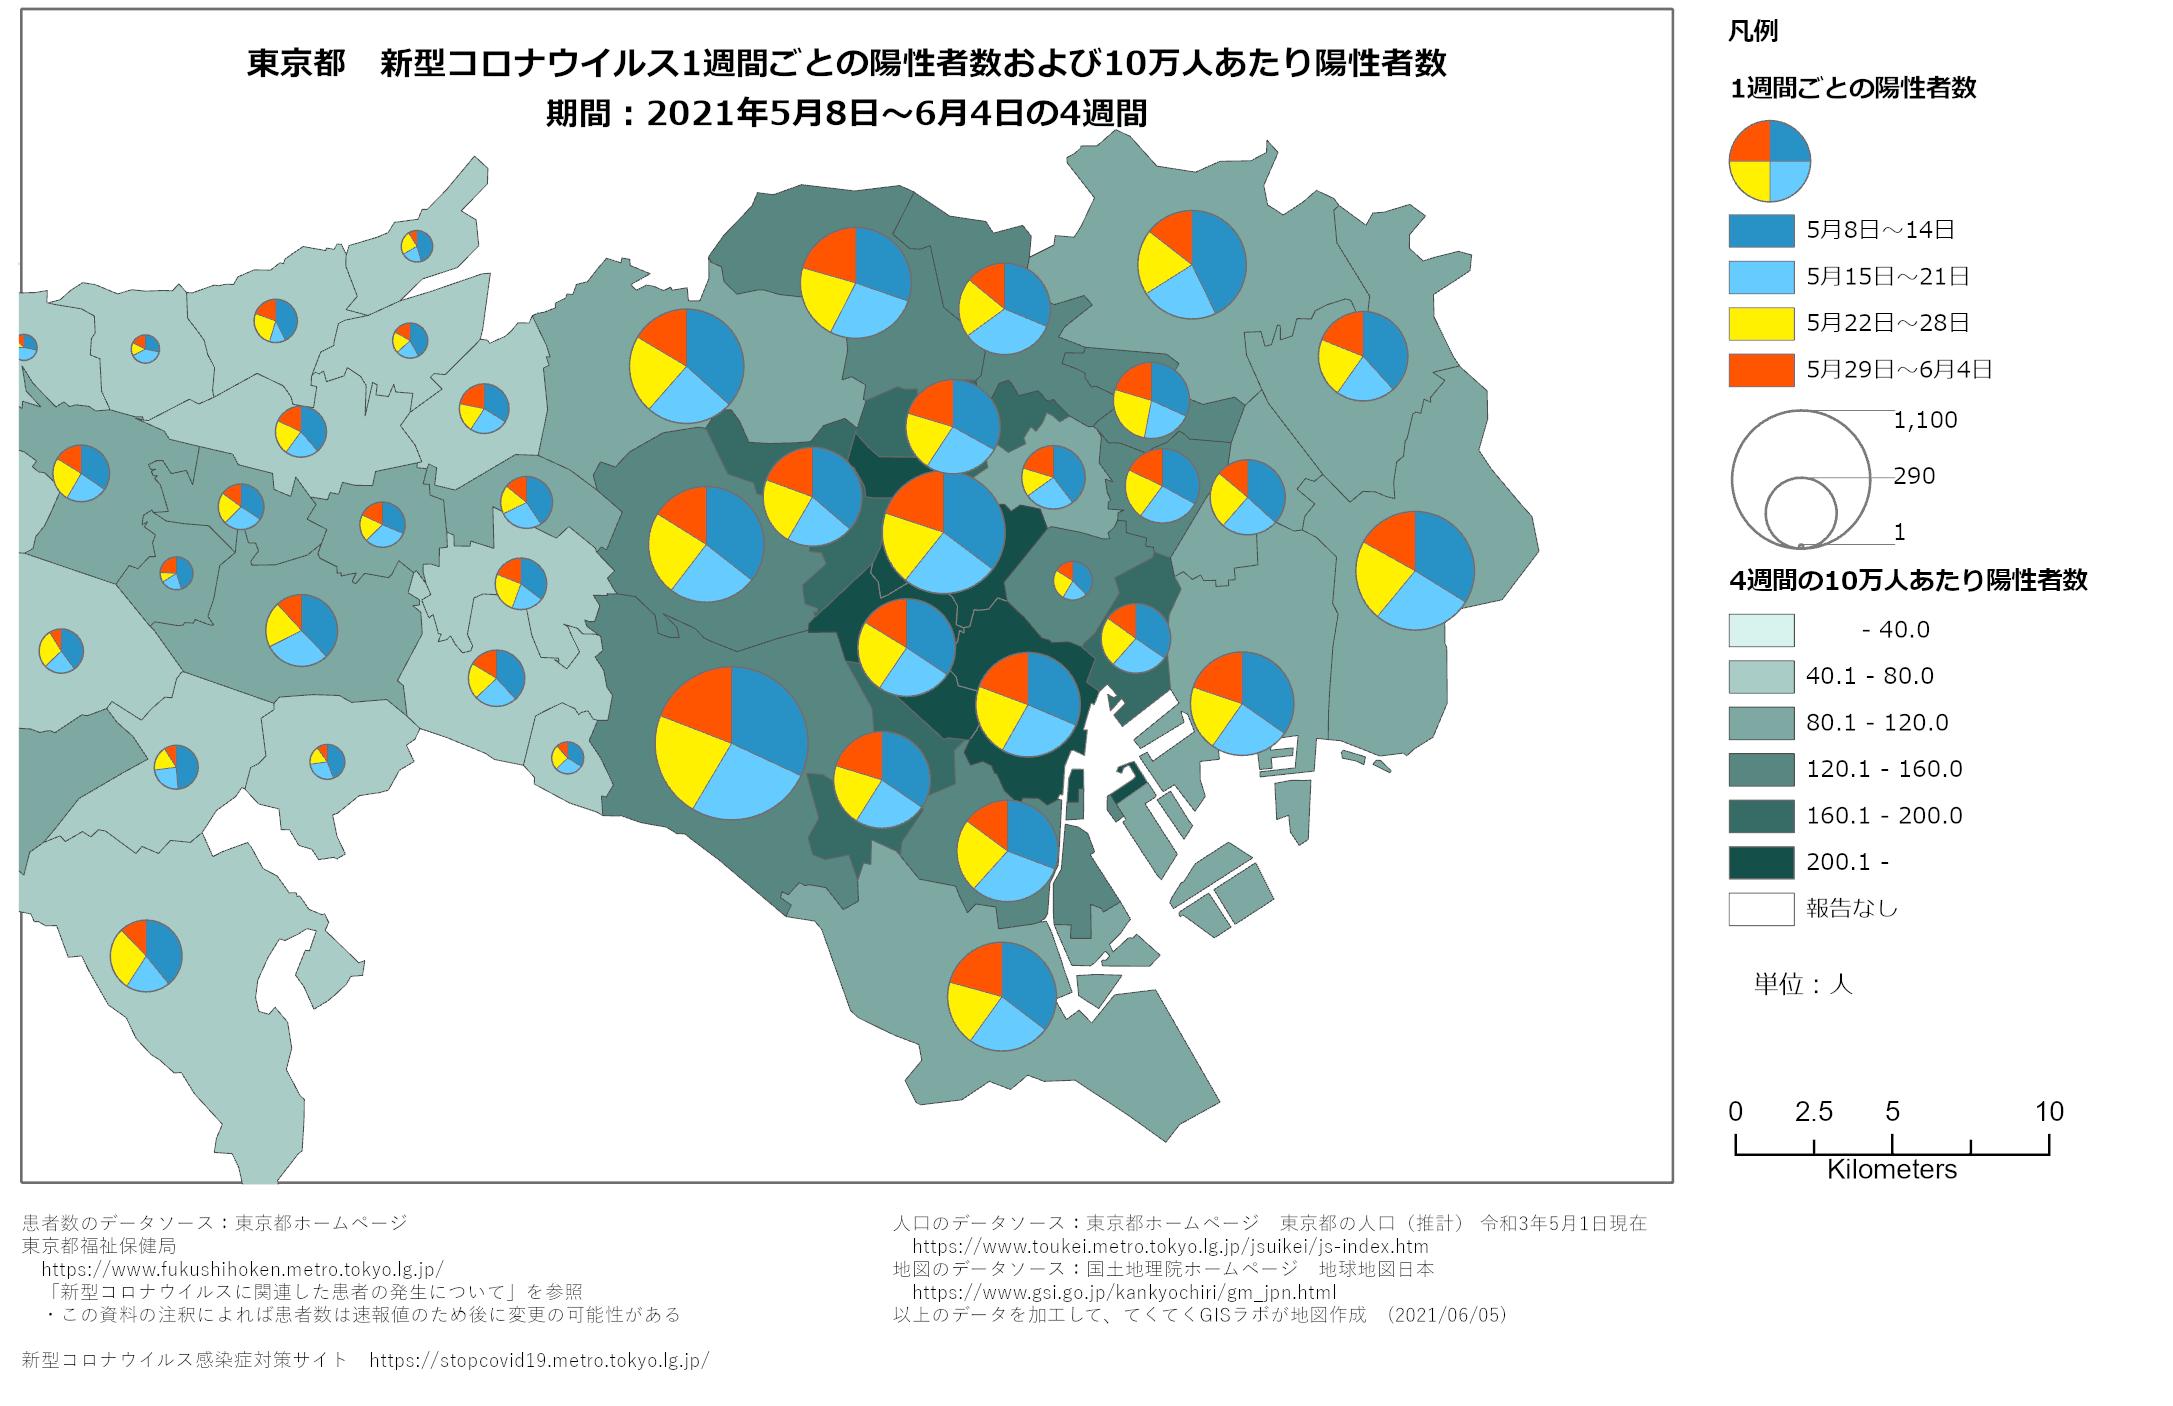 1週間ごと感染者数、東京都、5月8日〜6月4日